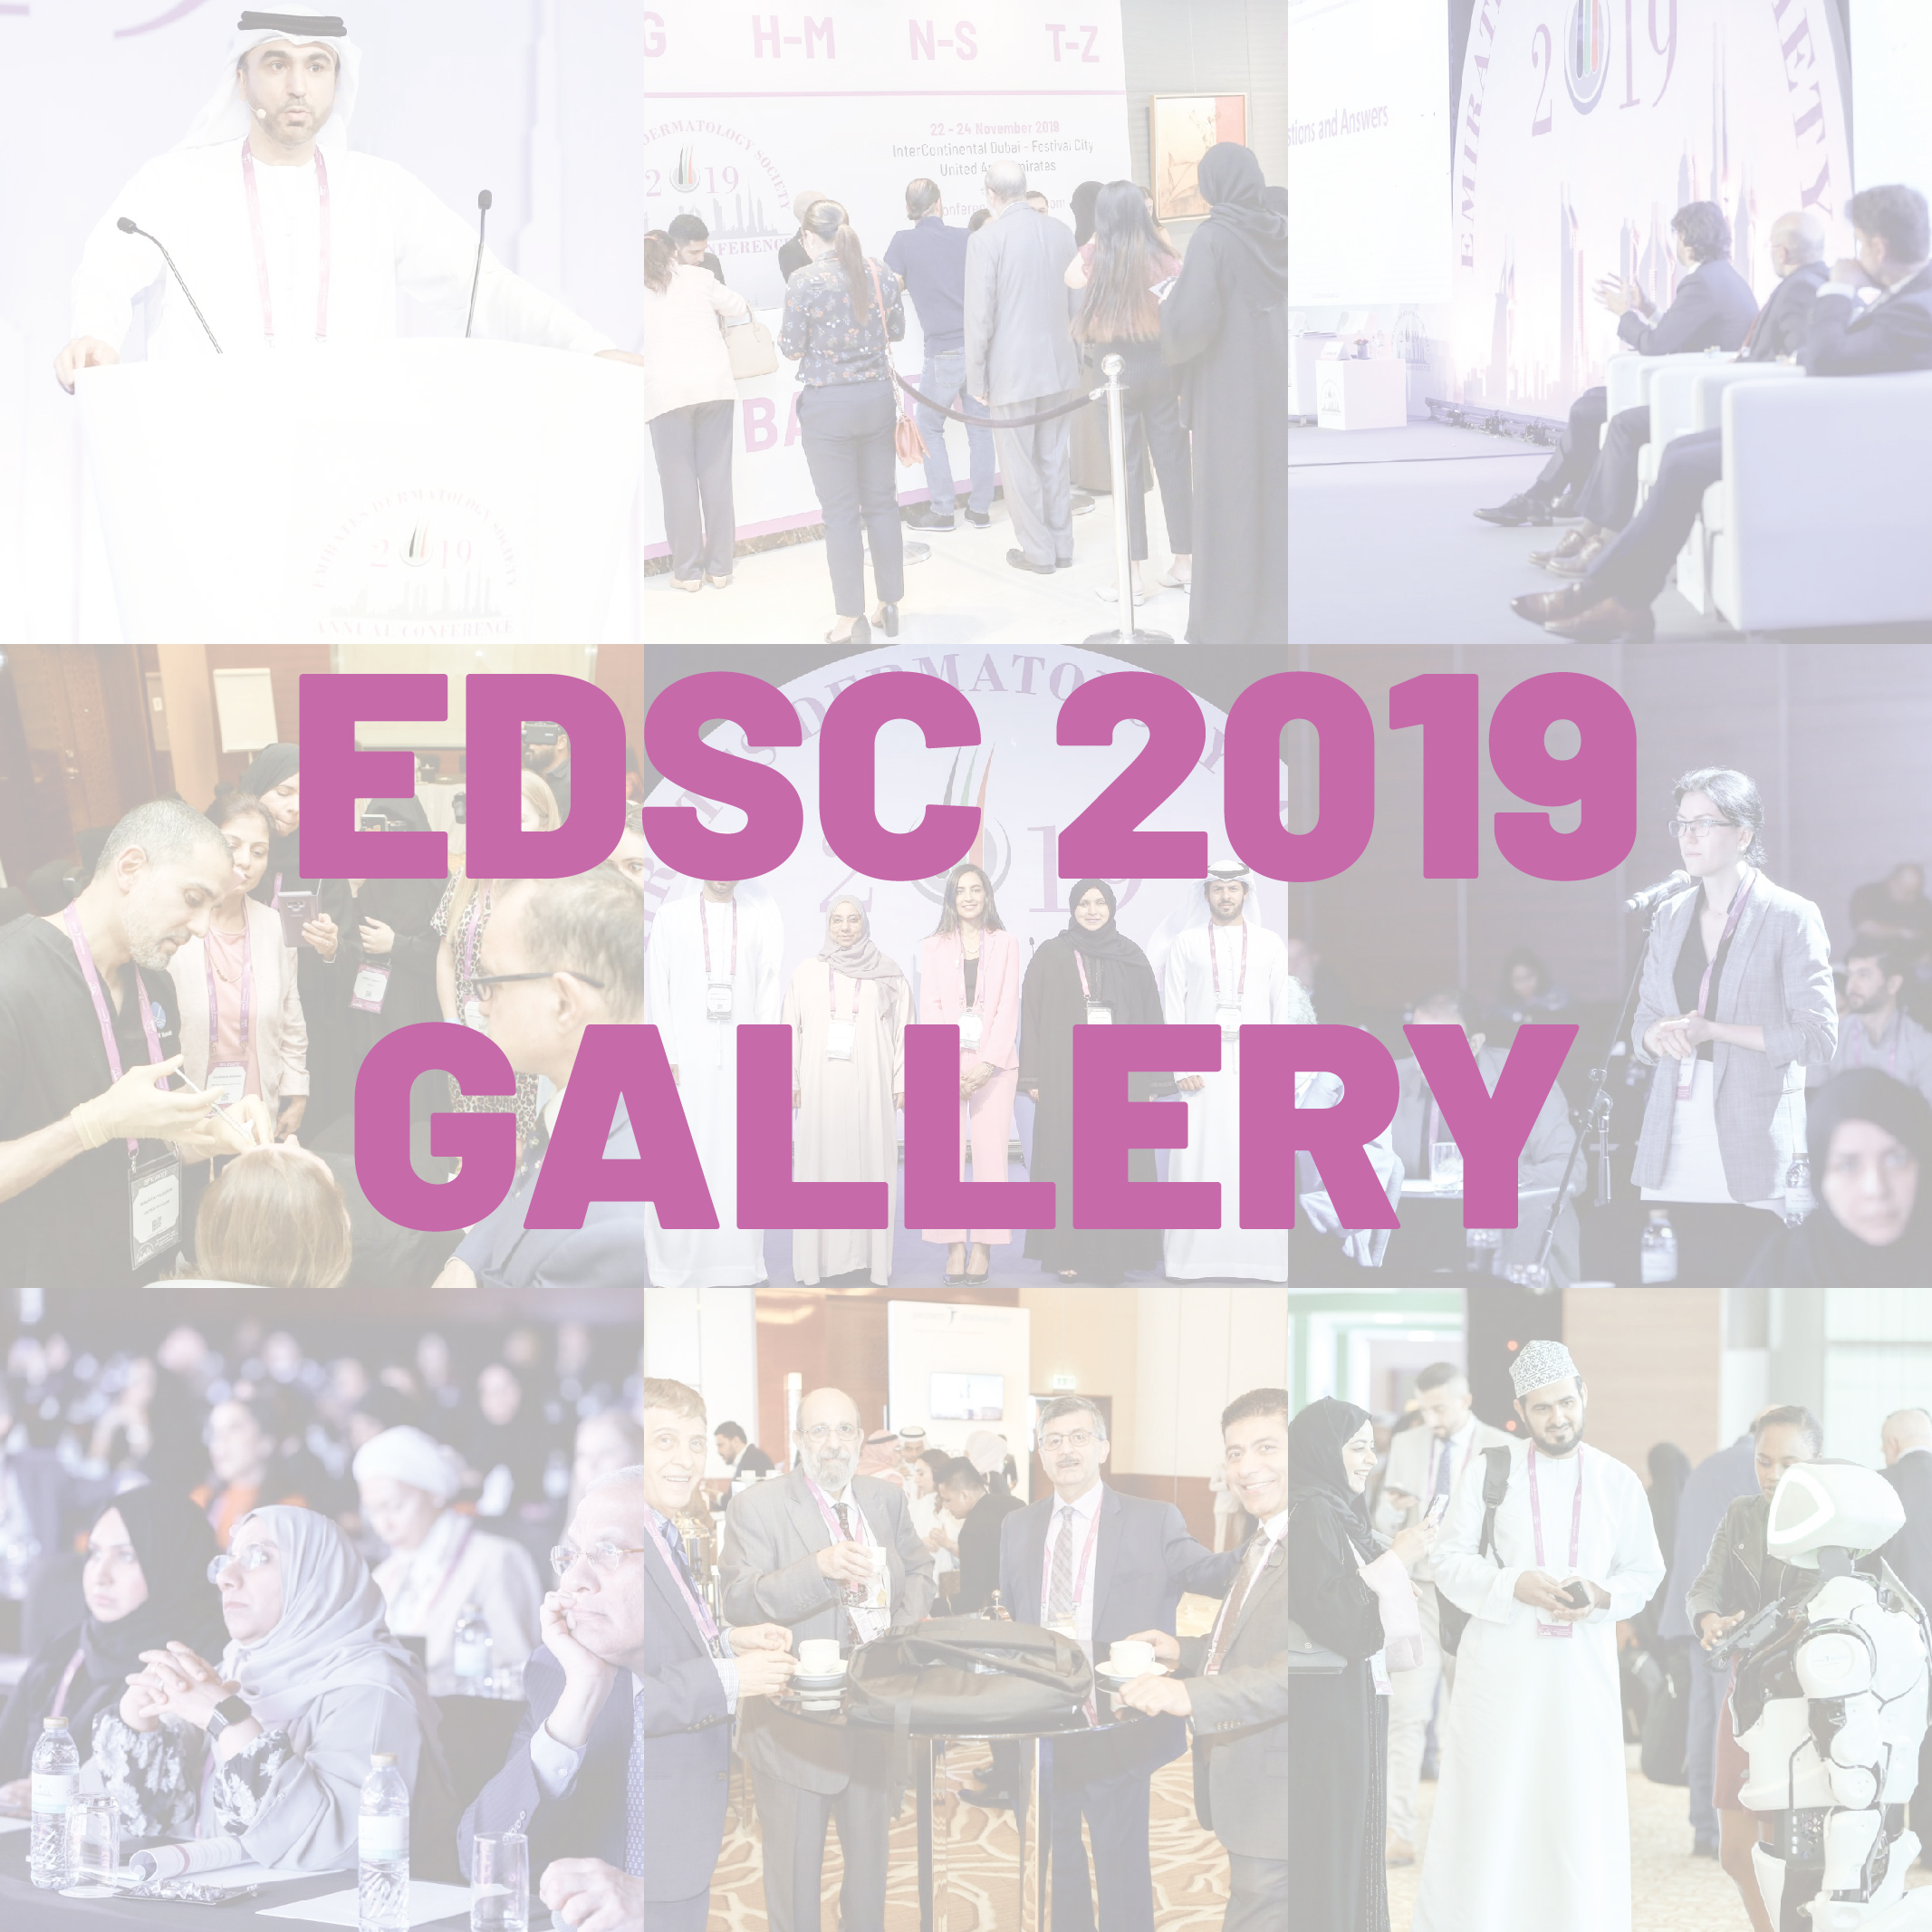 EDSC 2019 GALLERY